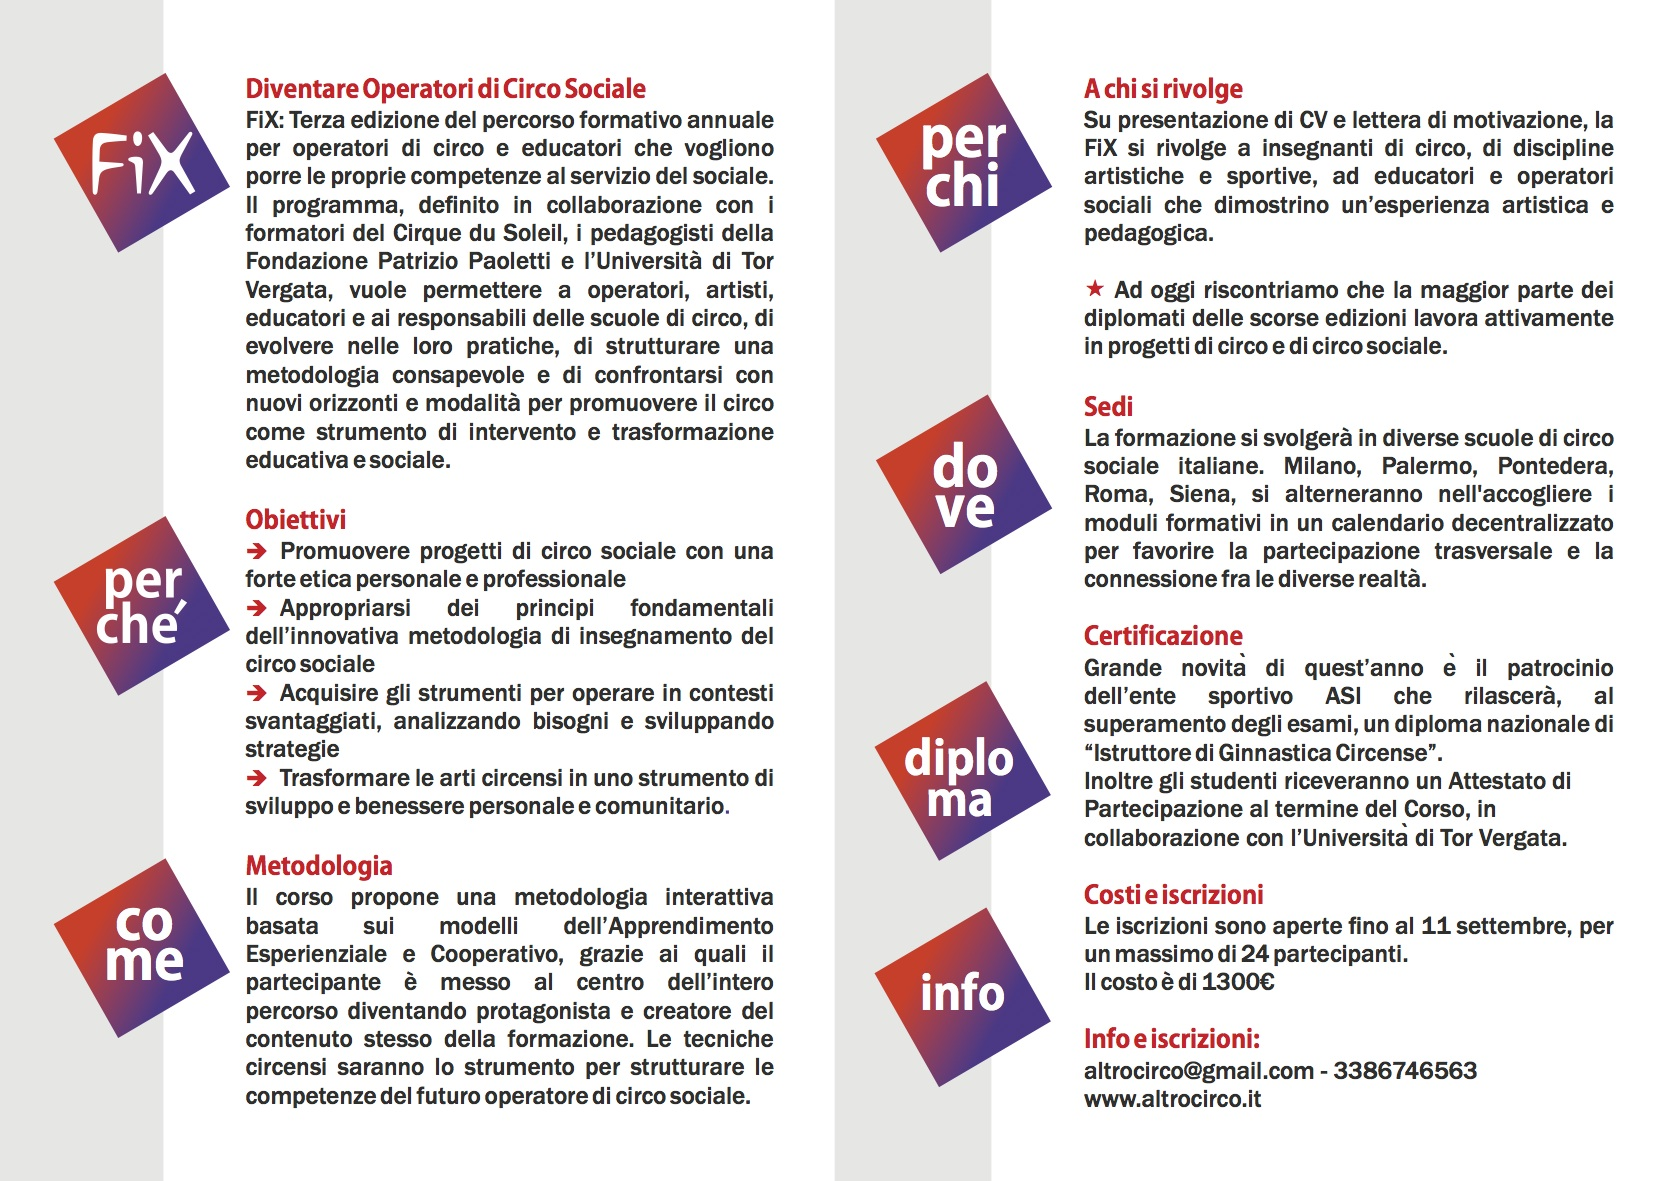 Leaflet Fics 2018 - interno